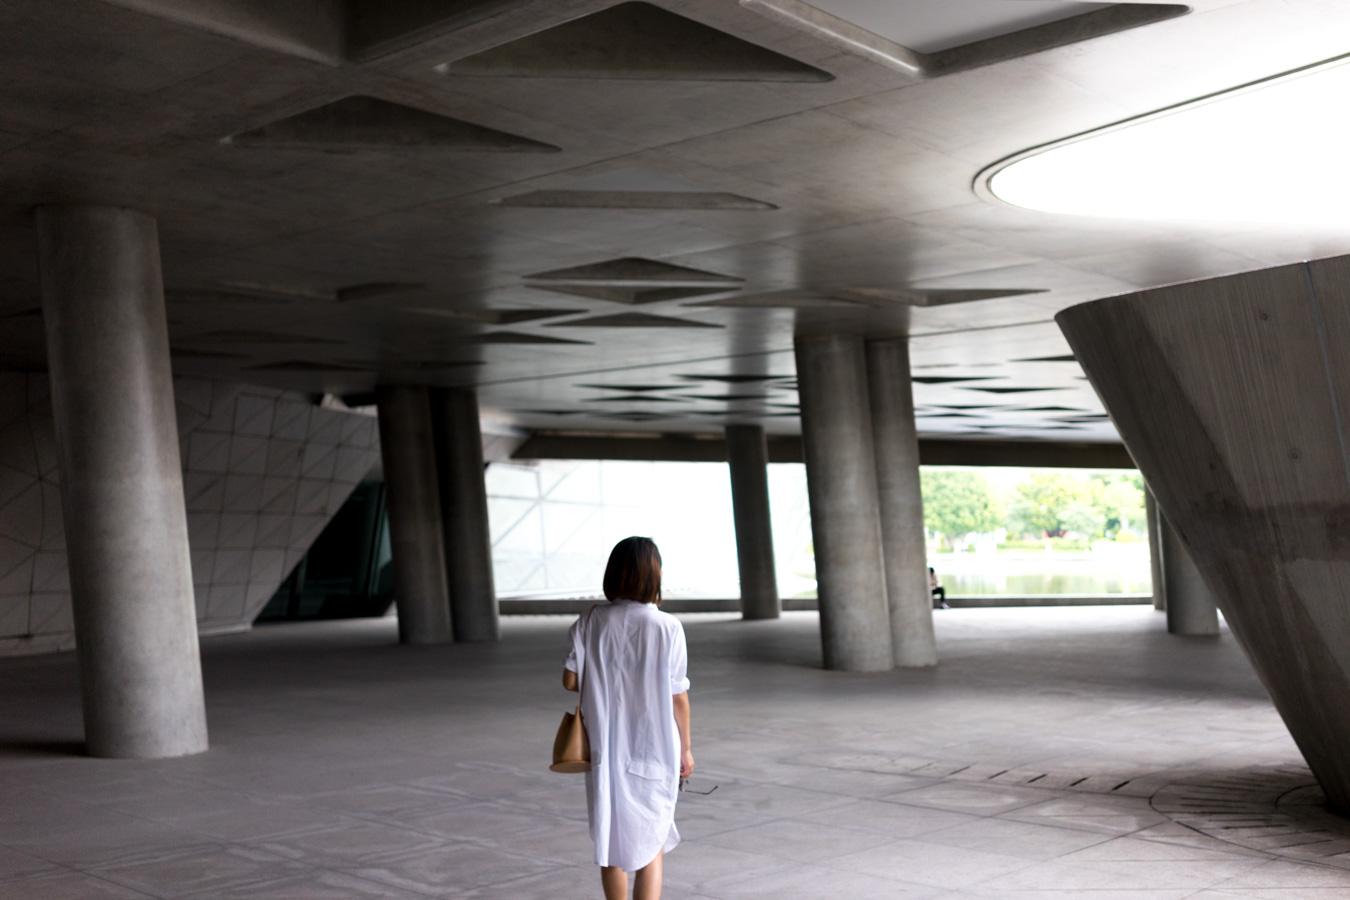 Le_Sycomore_Guangzhou_Opera_House-6.jpg